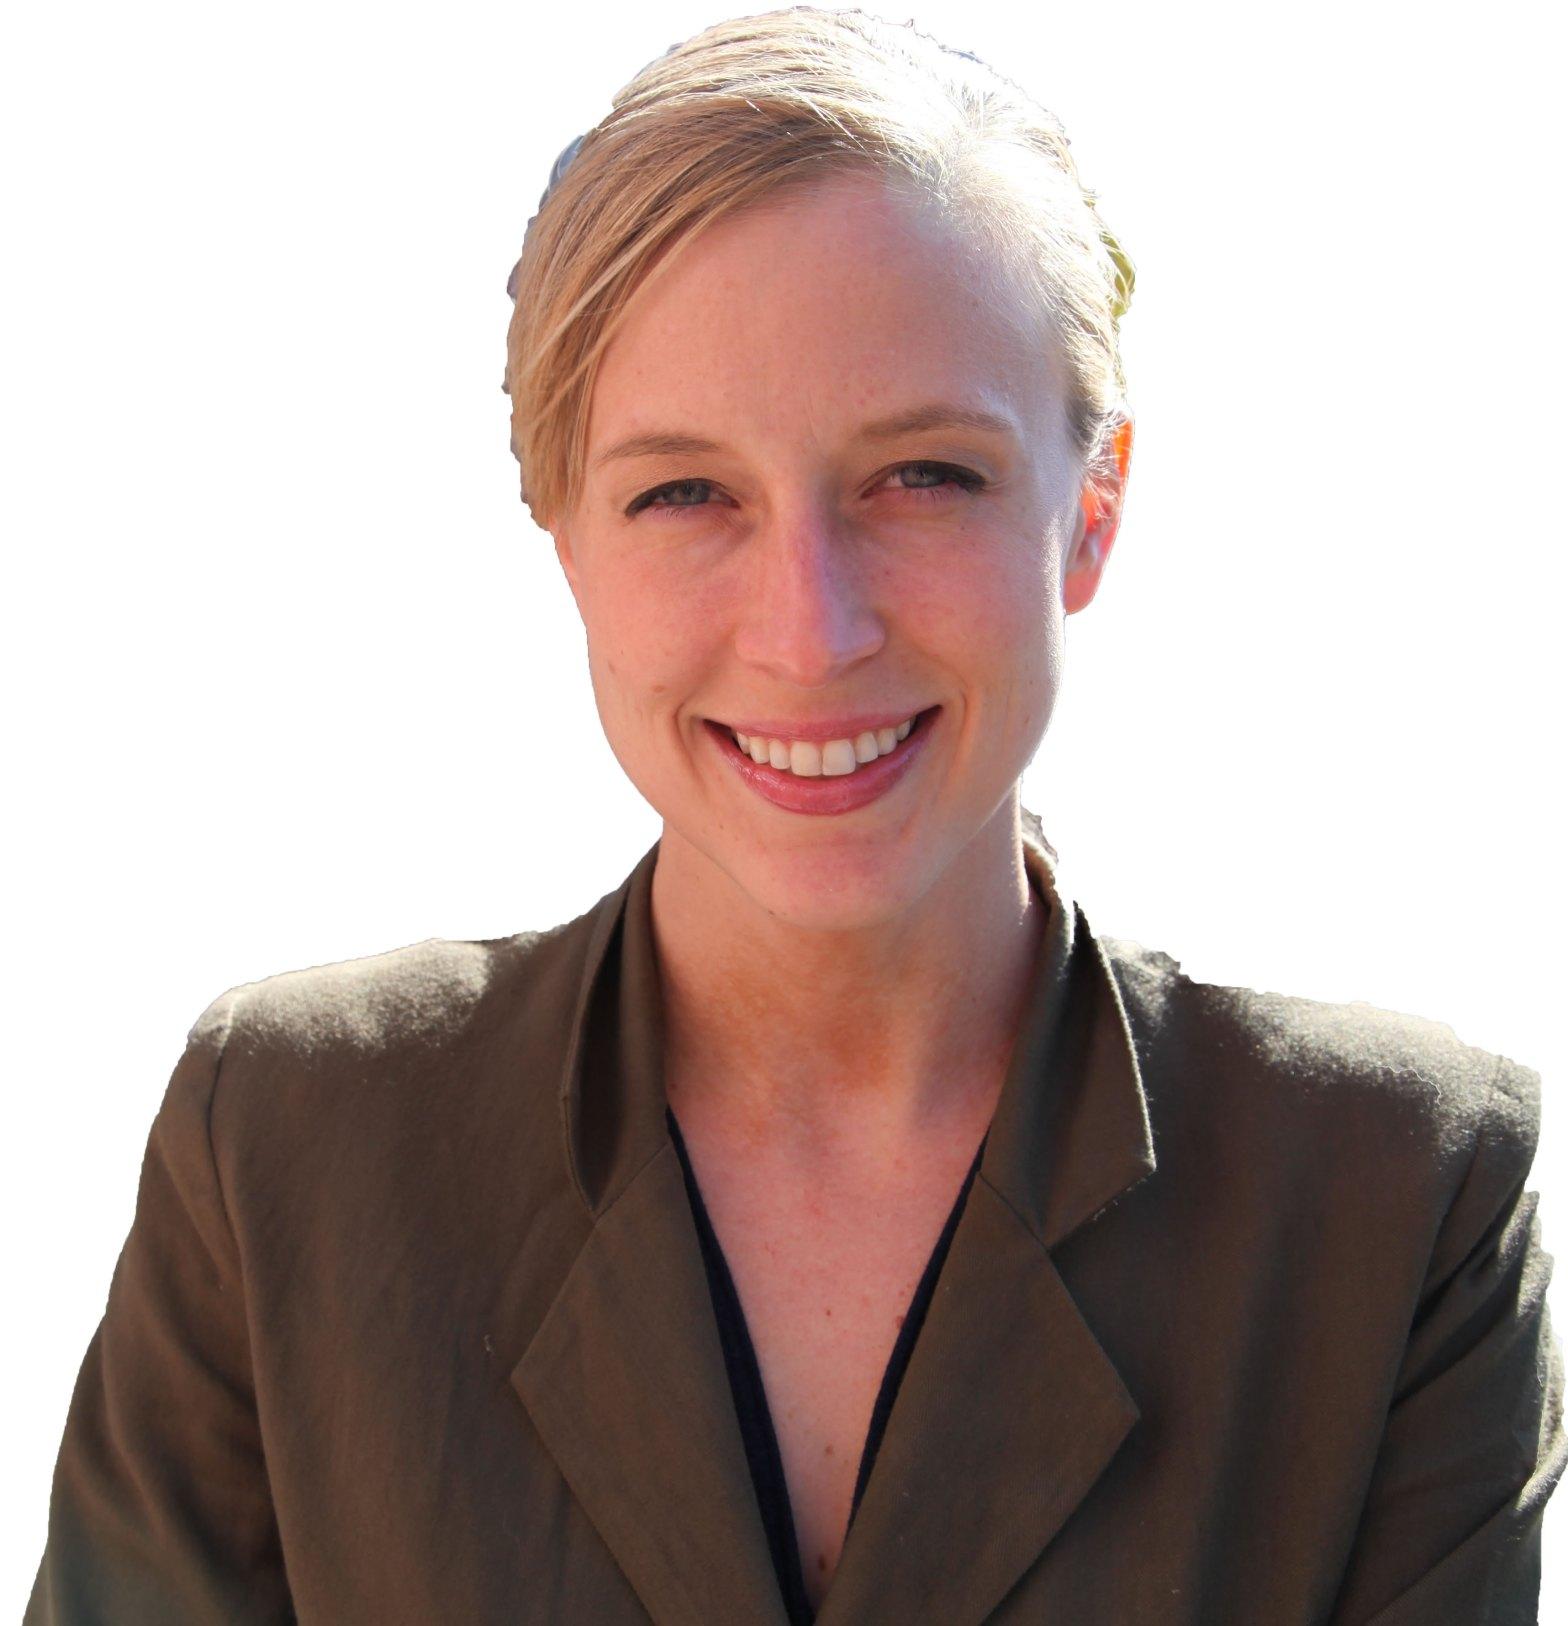 Dr. Amy Finn, Assistant Professor